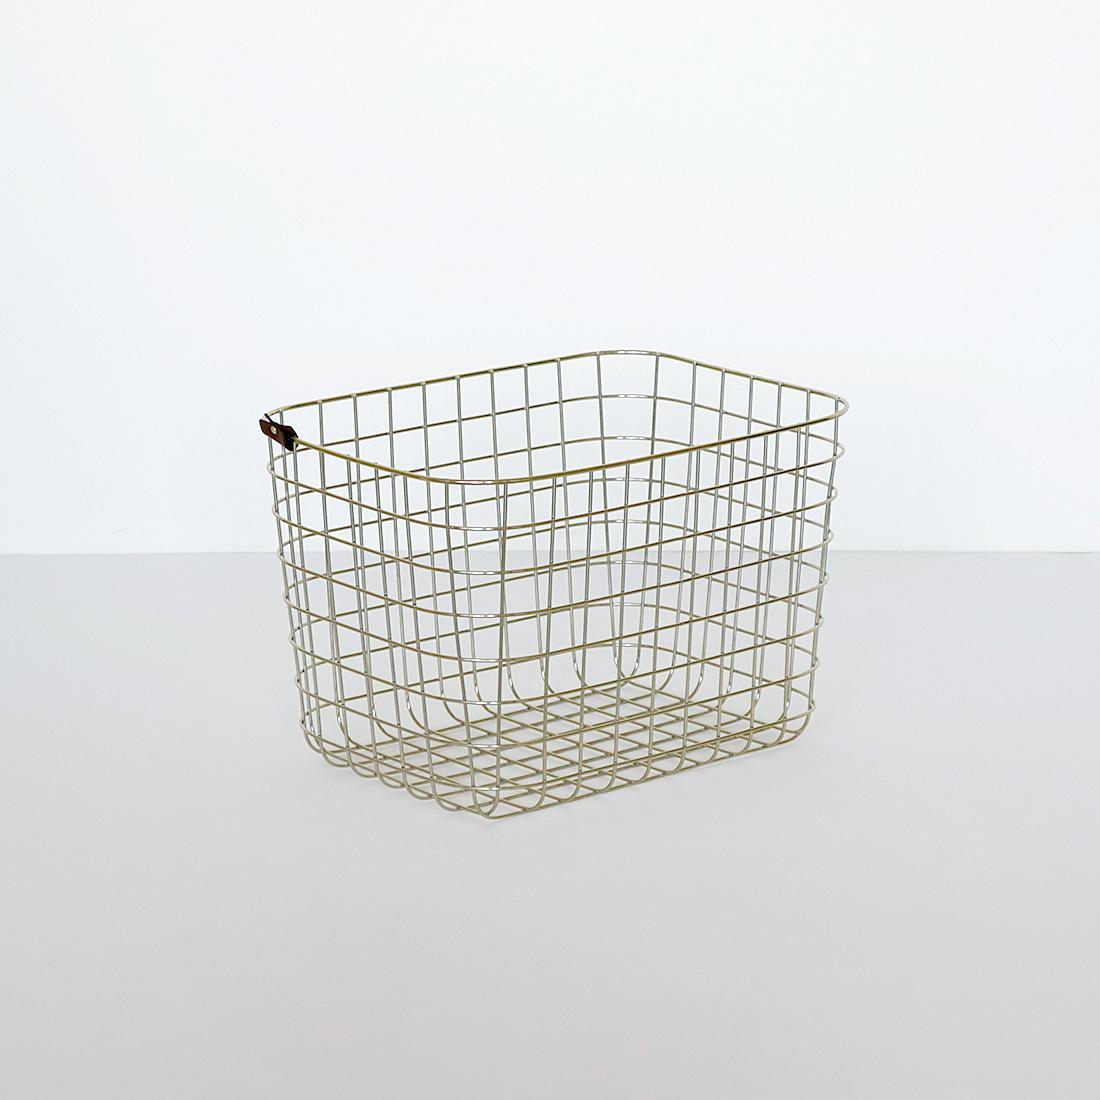 【MOHEIM】 WIRE BASKET (M / gold) ゴールド ワイヤーバスケット 収納 カゴ インテリア